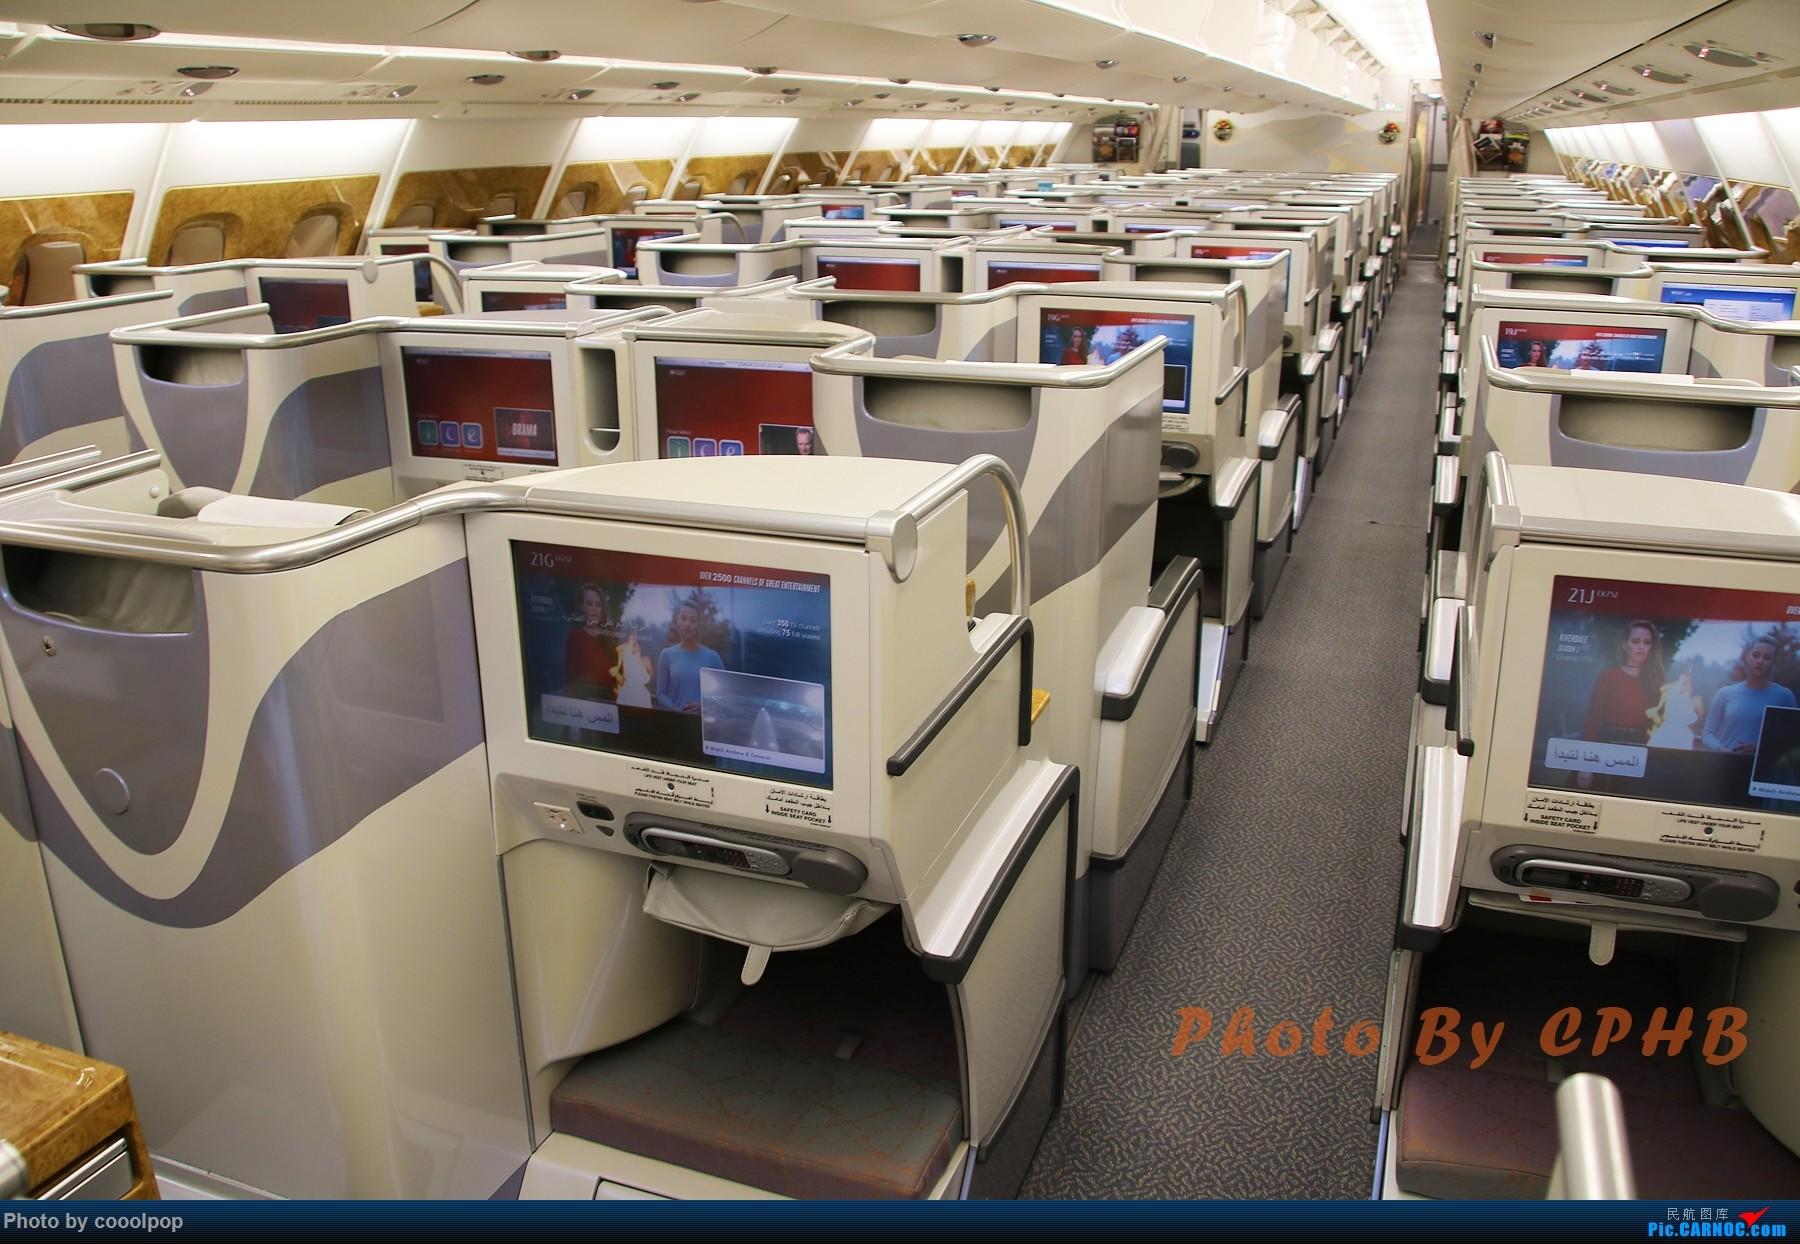 Re:[原创]好些年没来了!发了去年的游记帖子吧 PEK-CDG-VCE-DXB-PEK。法航 阿联酋航空混飞 EK A380驾驶舱 商务舱 头等舱 外场 A380-800 A6-EEC 中国北京首都国际机场